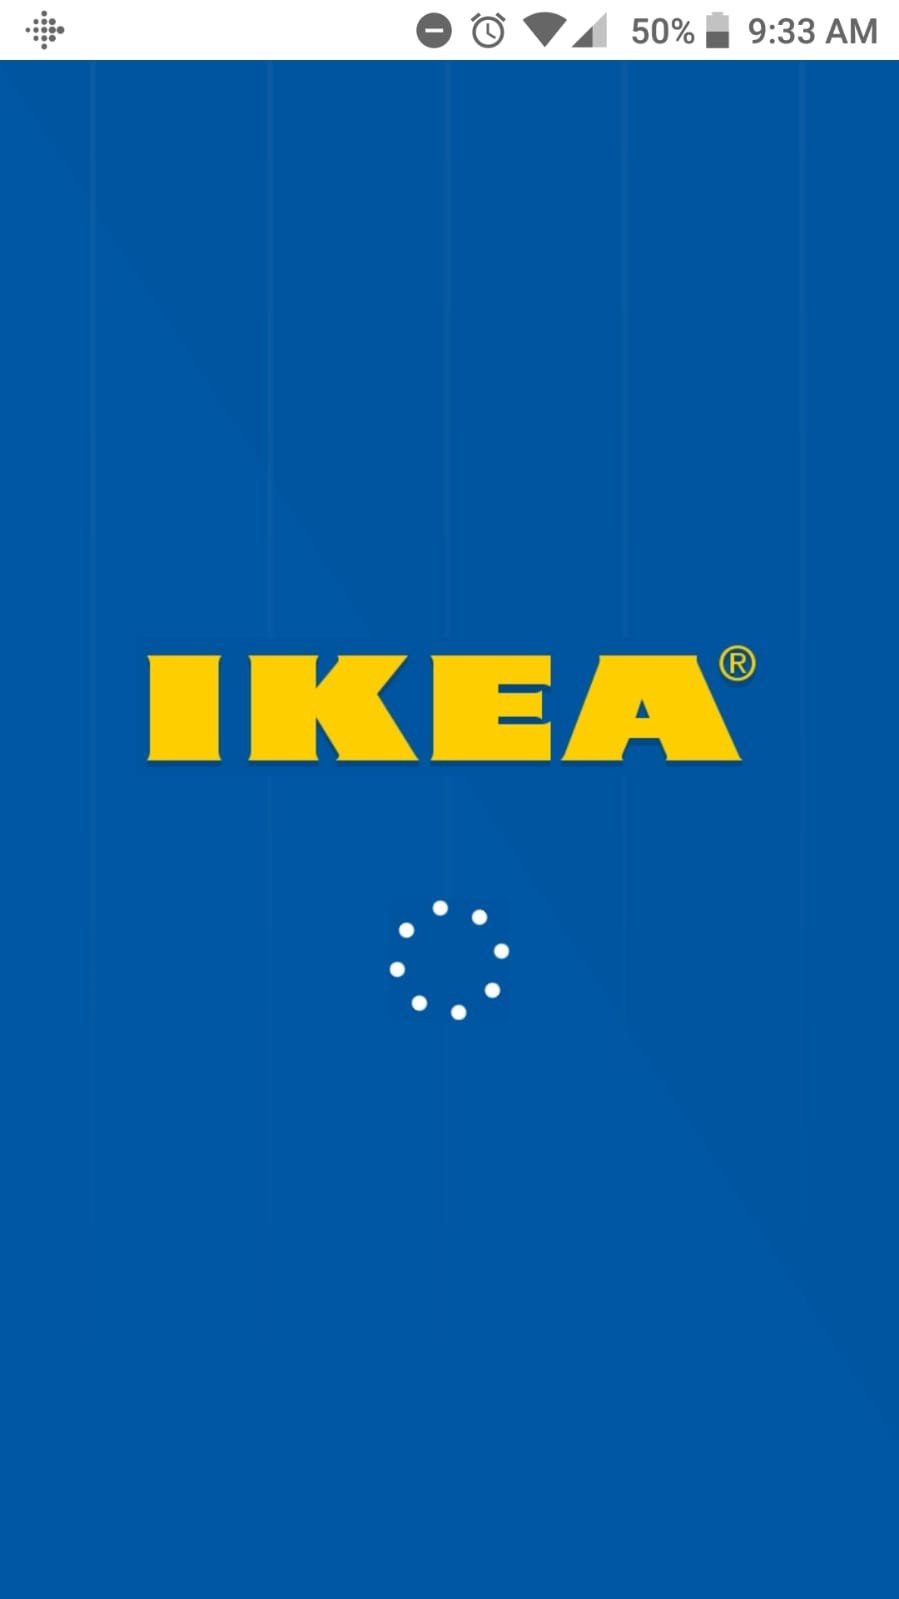 Catalogue IKEA Android image 5